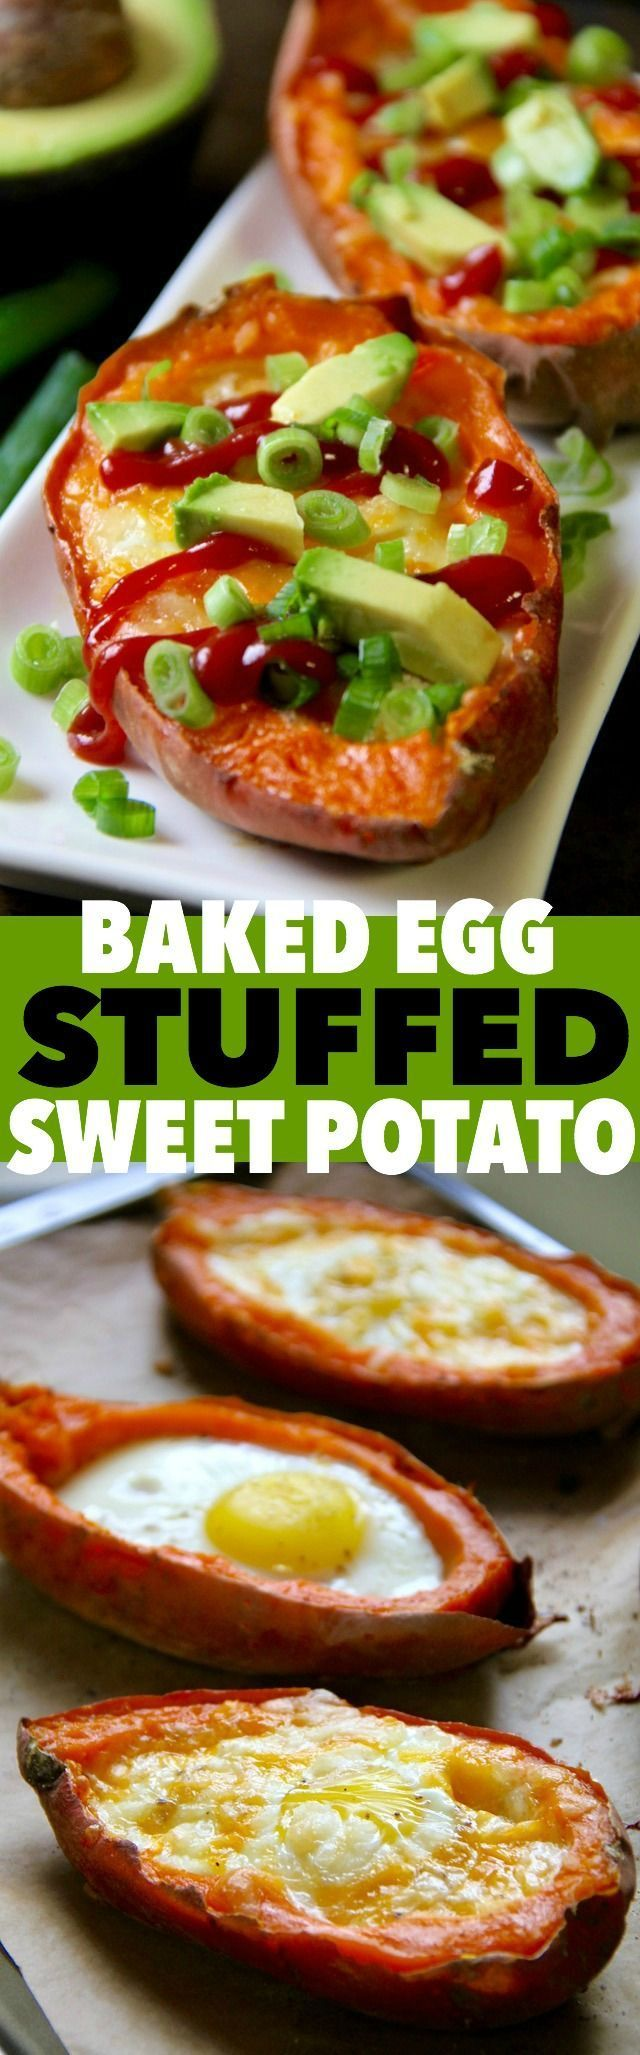 Baked Egg Stuffed Sweet Potatoes